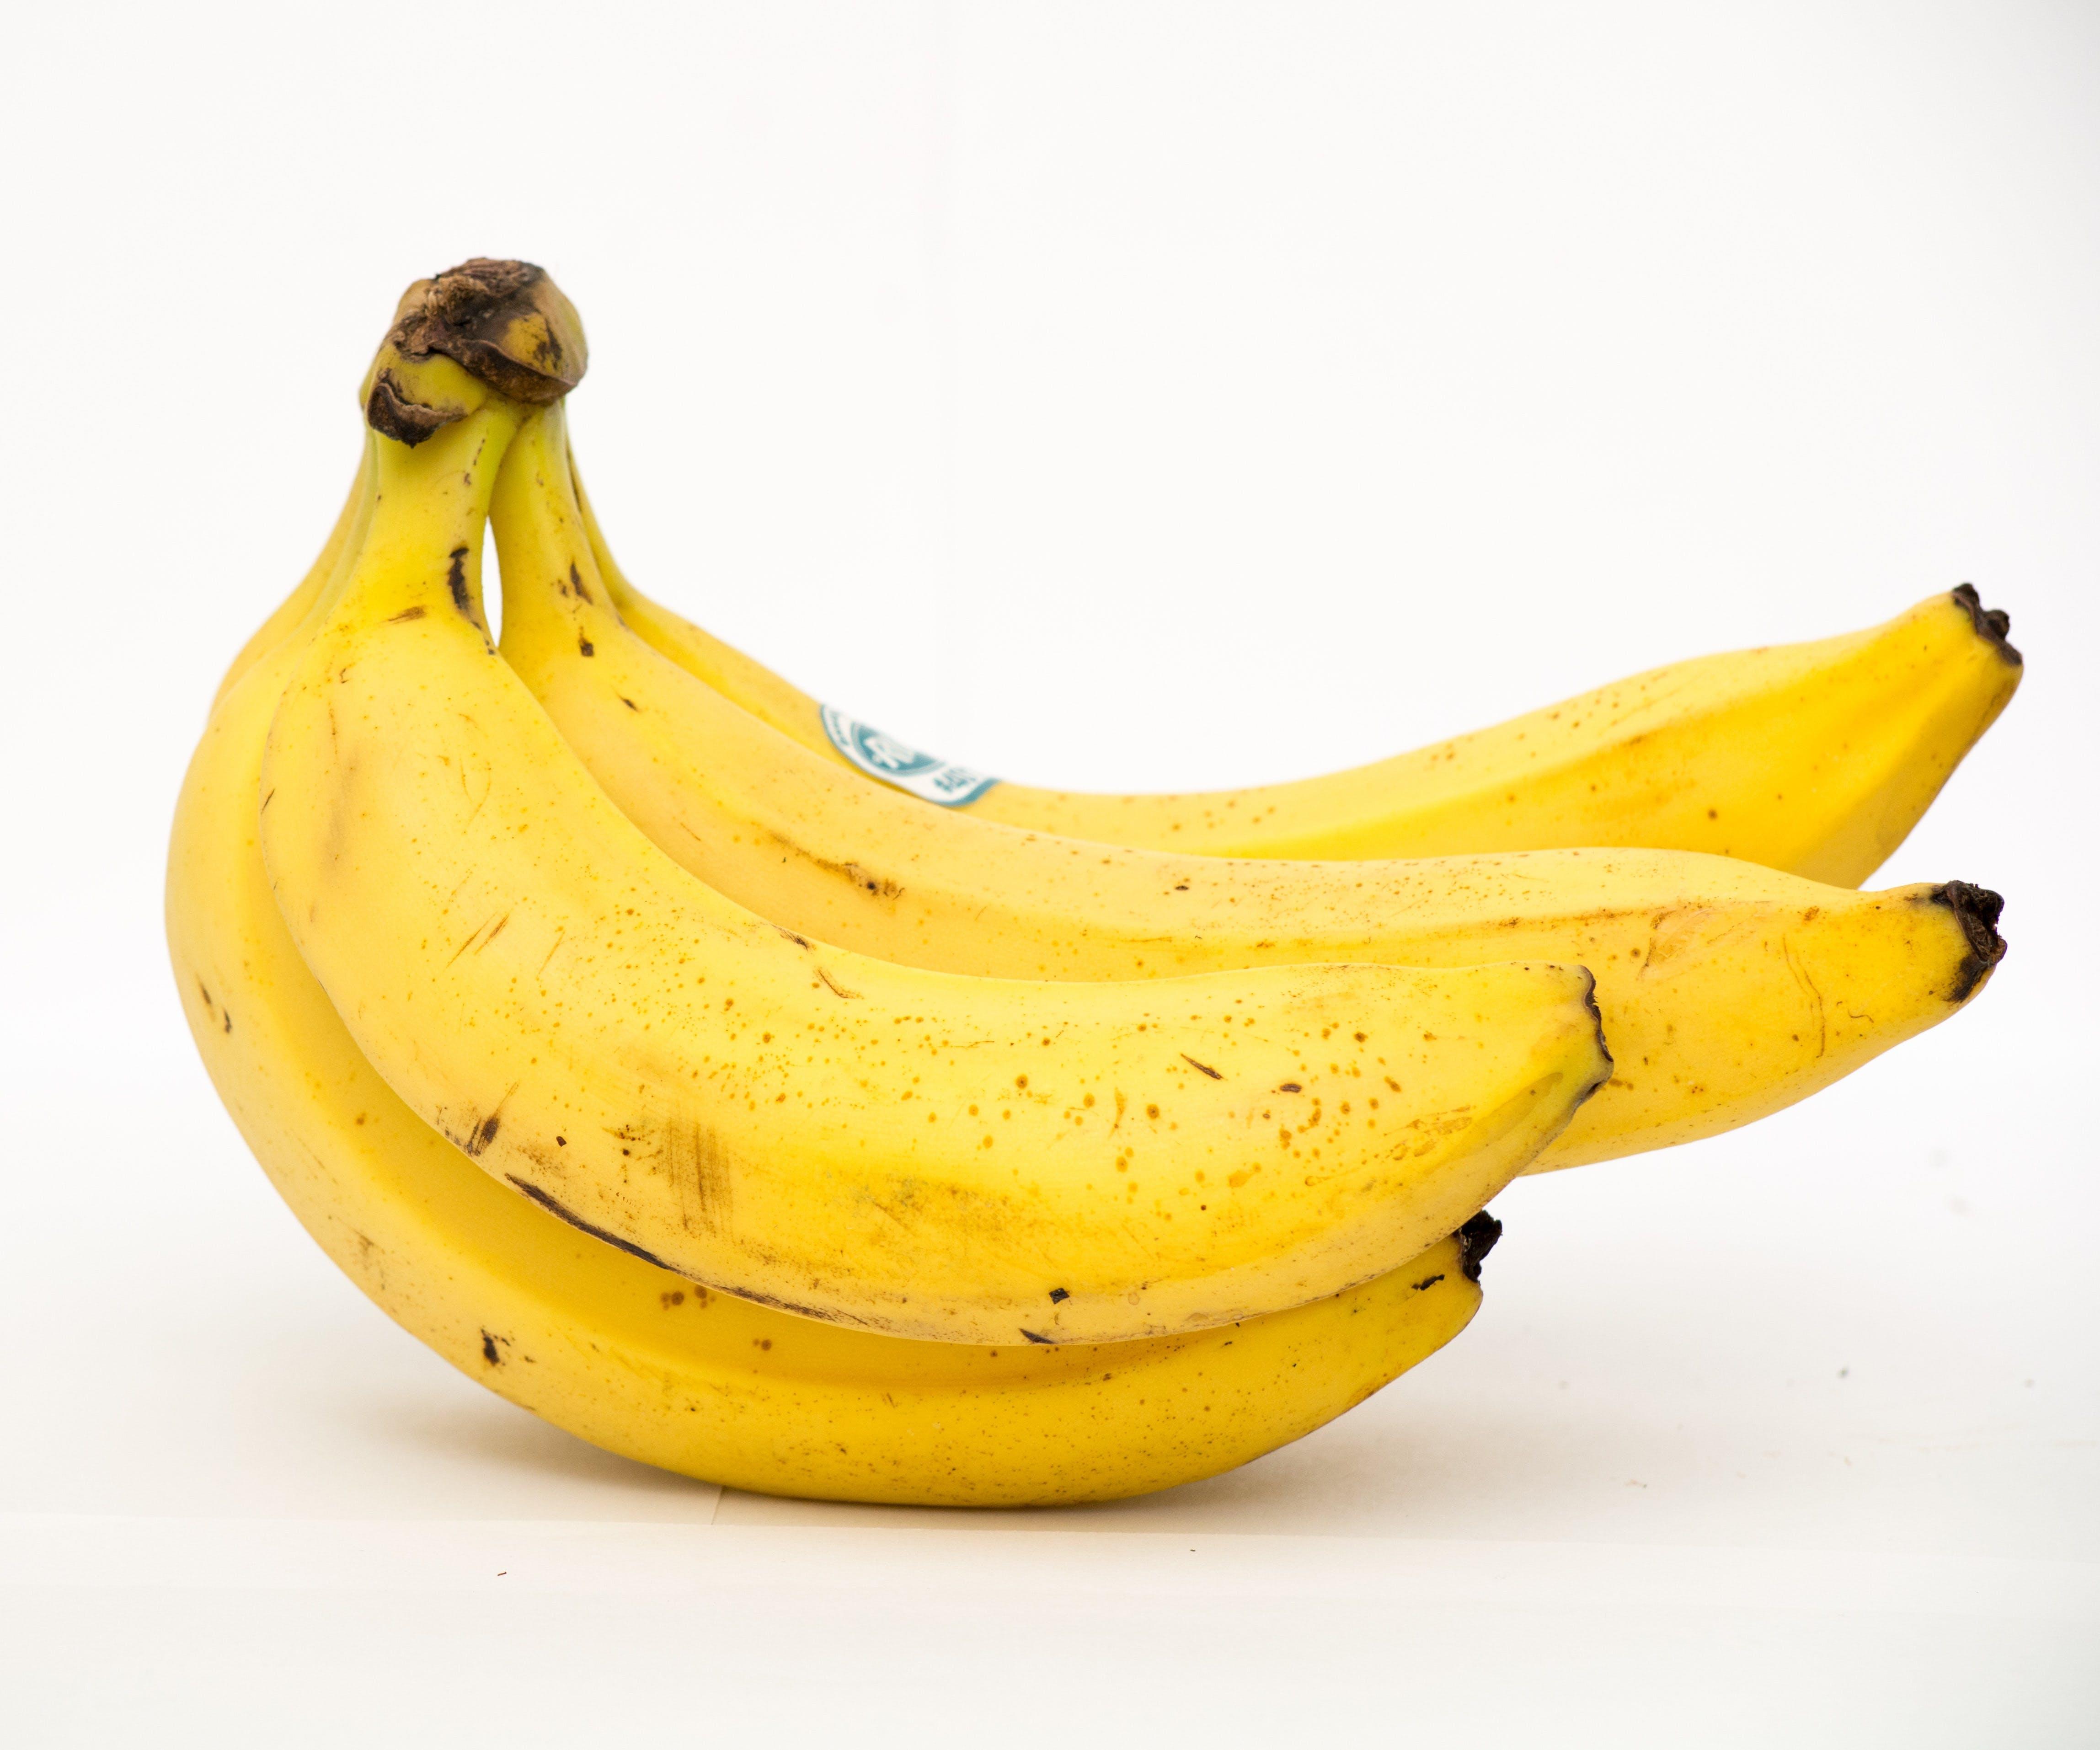 Free stock photo of healthy, yellow, banana, fruit